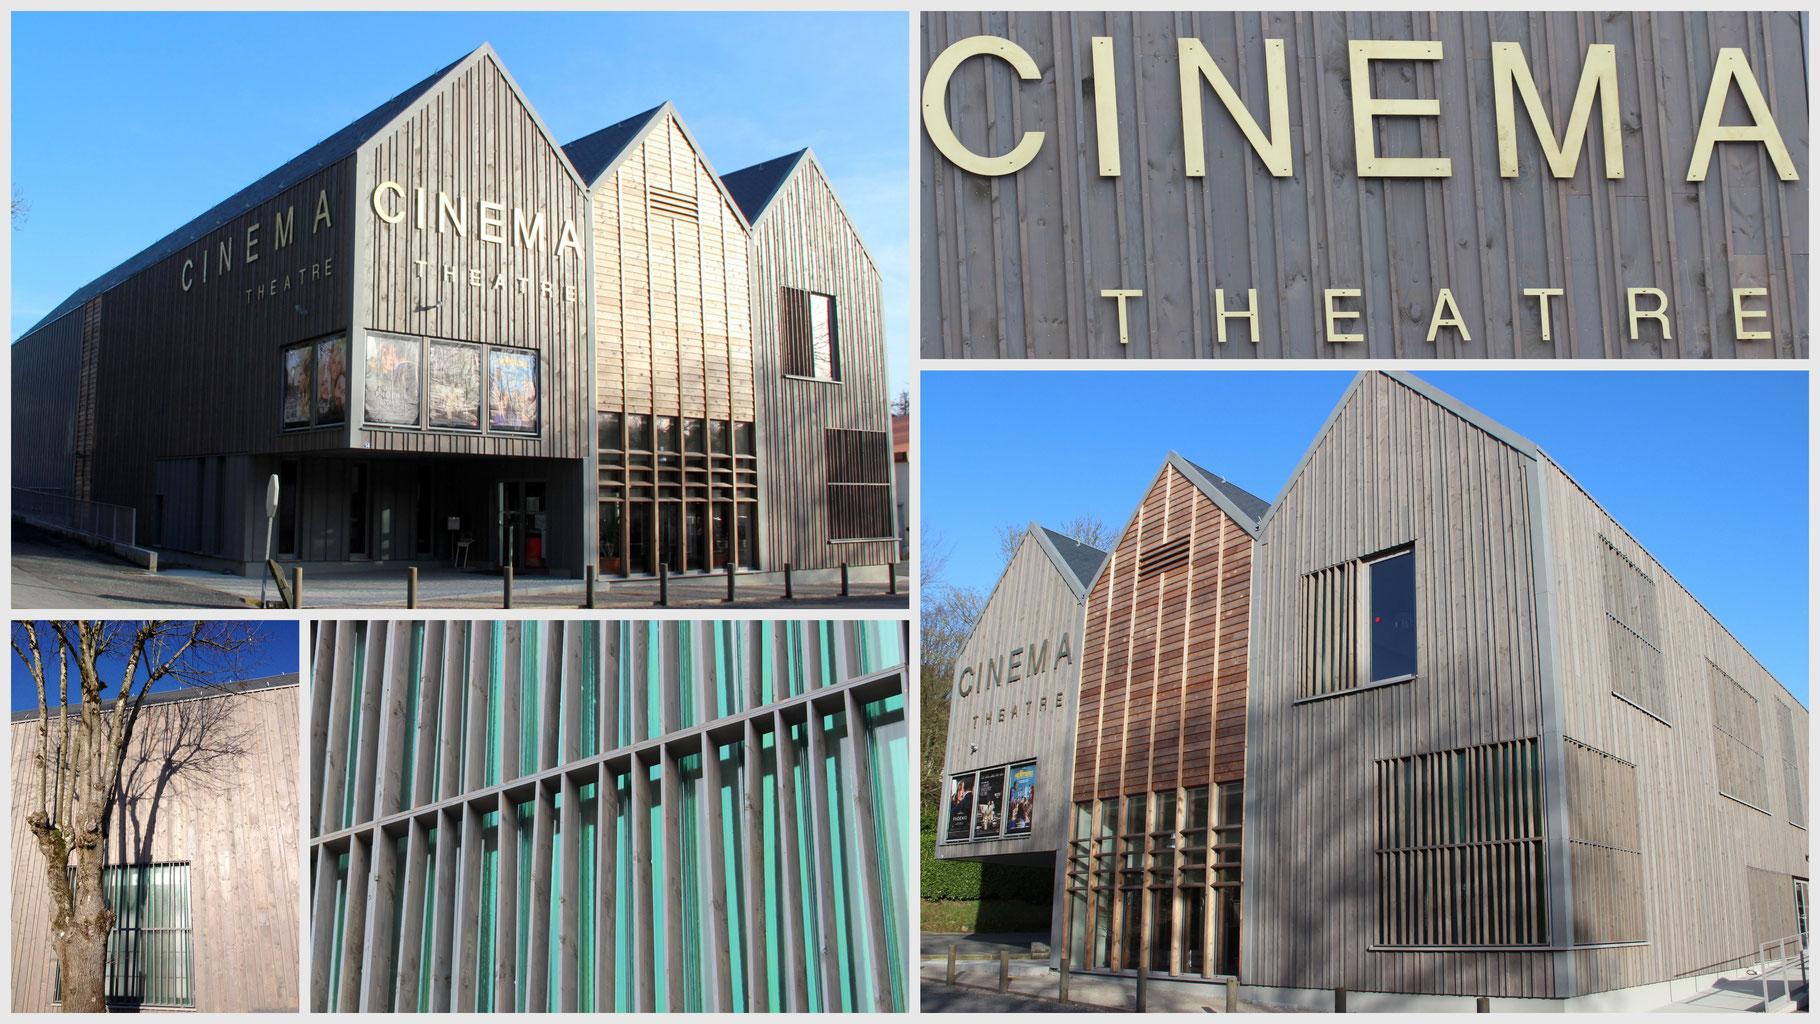 Villedieu cinéma - Villedieu Intercom